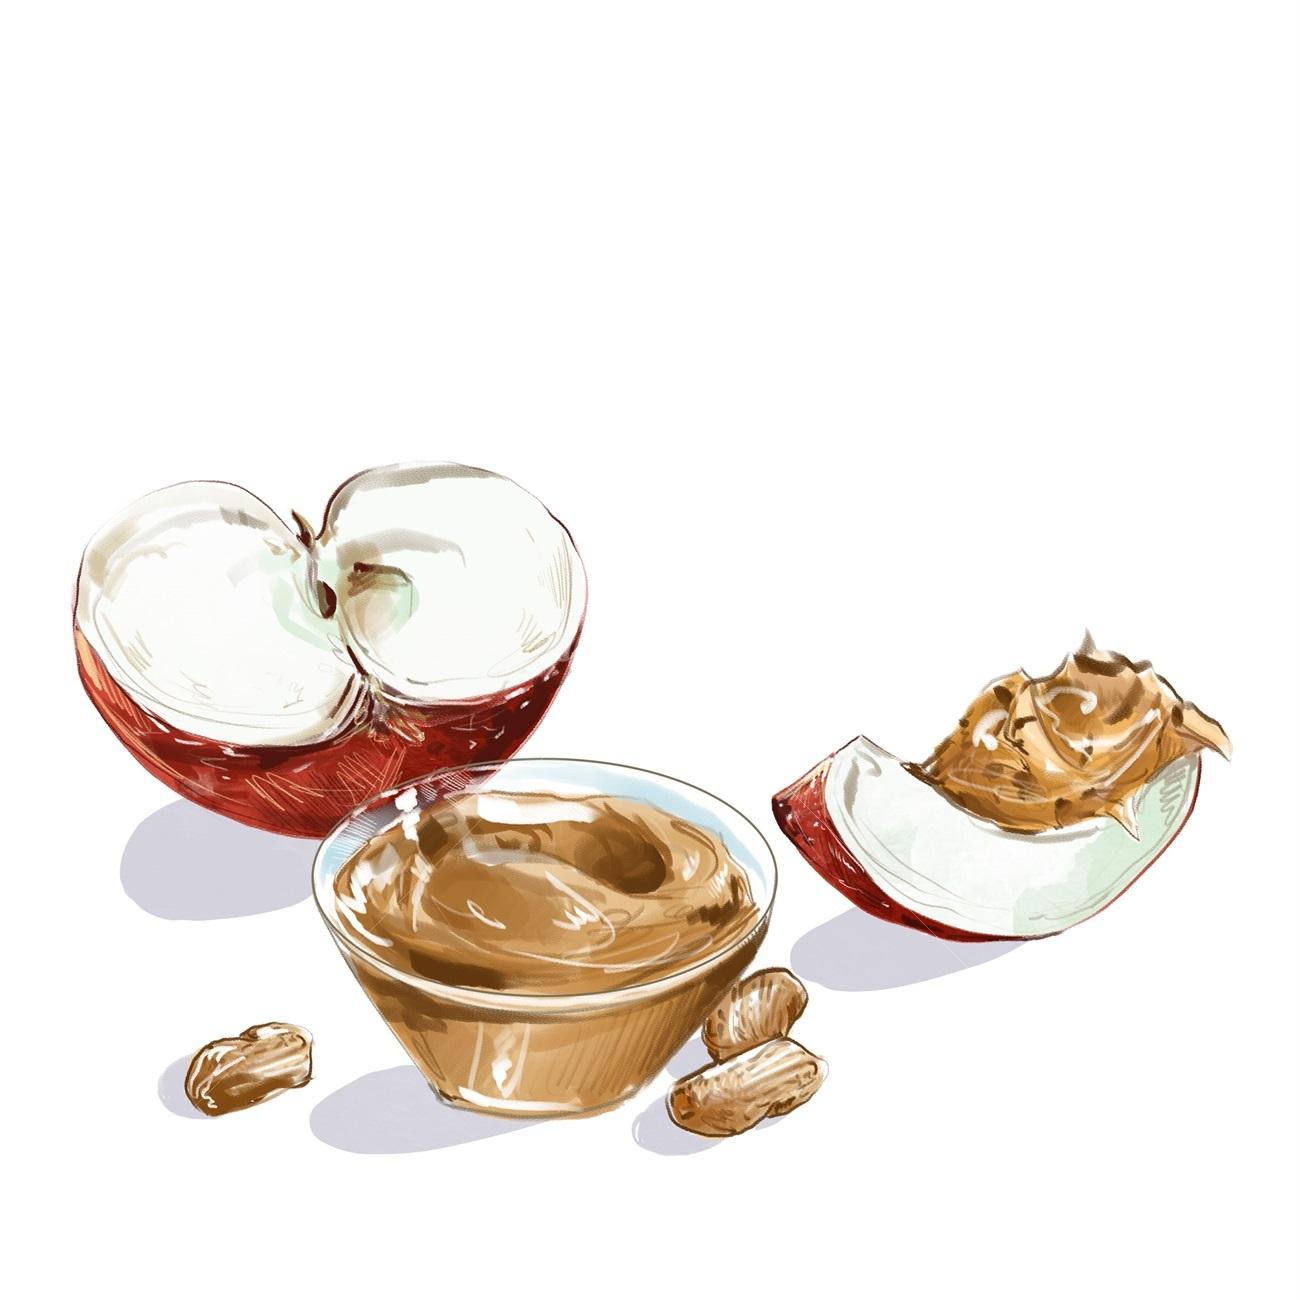 apple and peanut butter.jpg